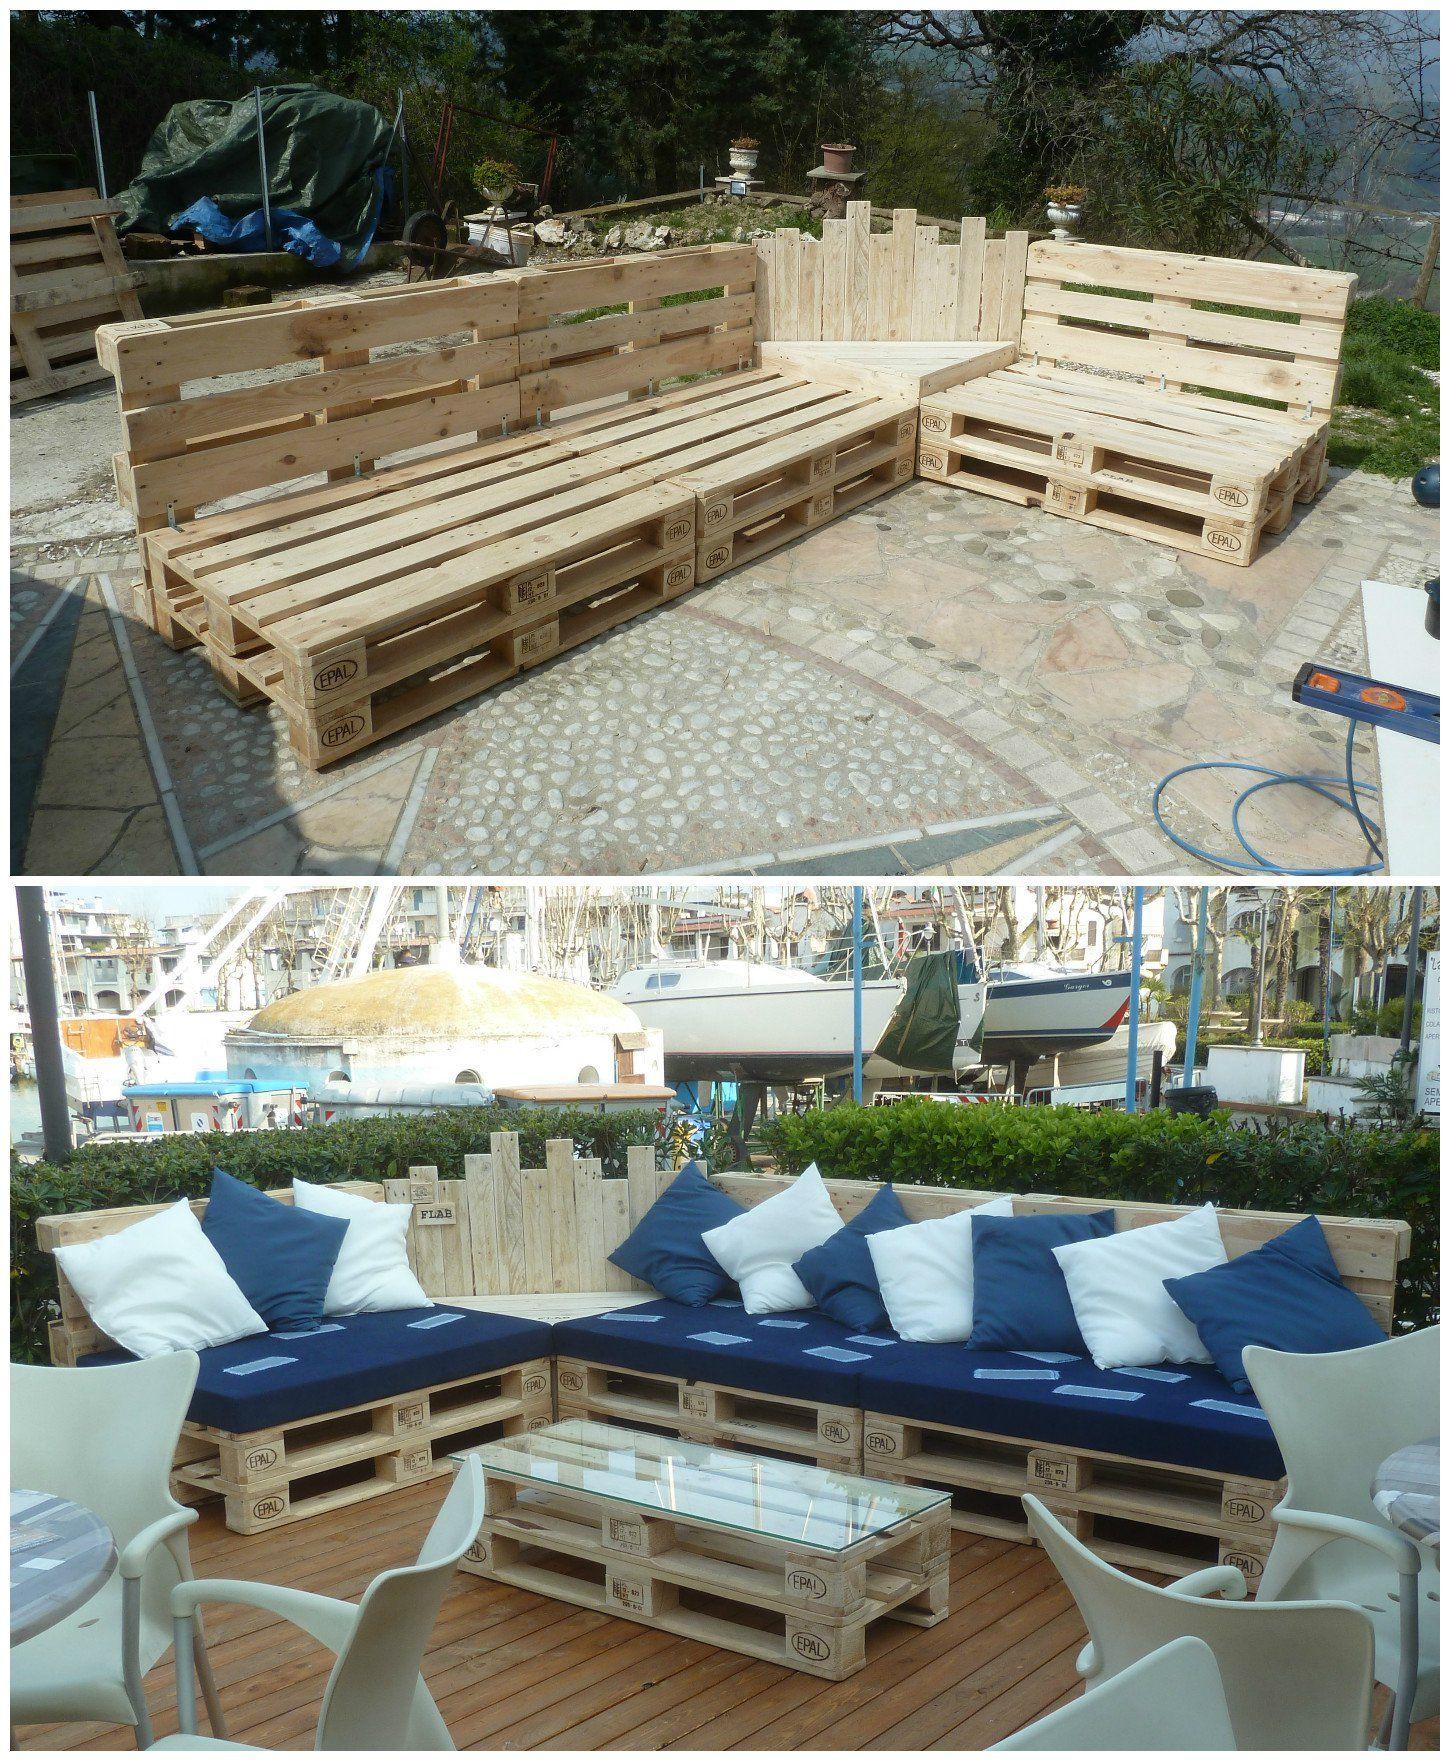 Outdoor Pallet Sectional Set / Maxi Divano Fatto Con I Pallet • 1001 Pallets